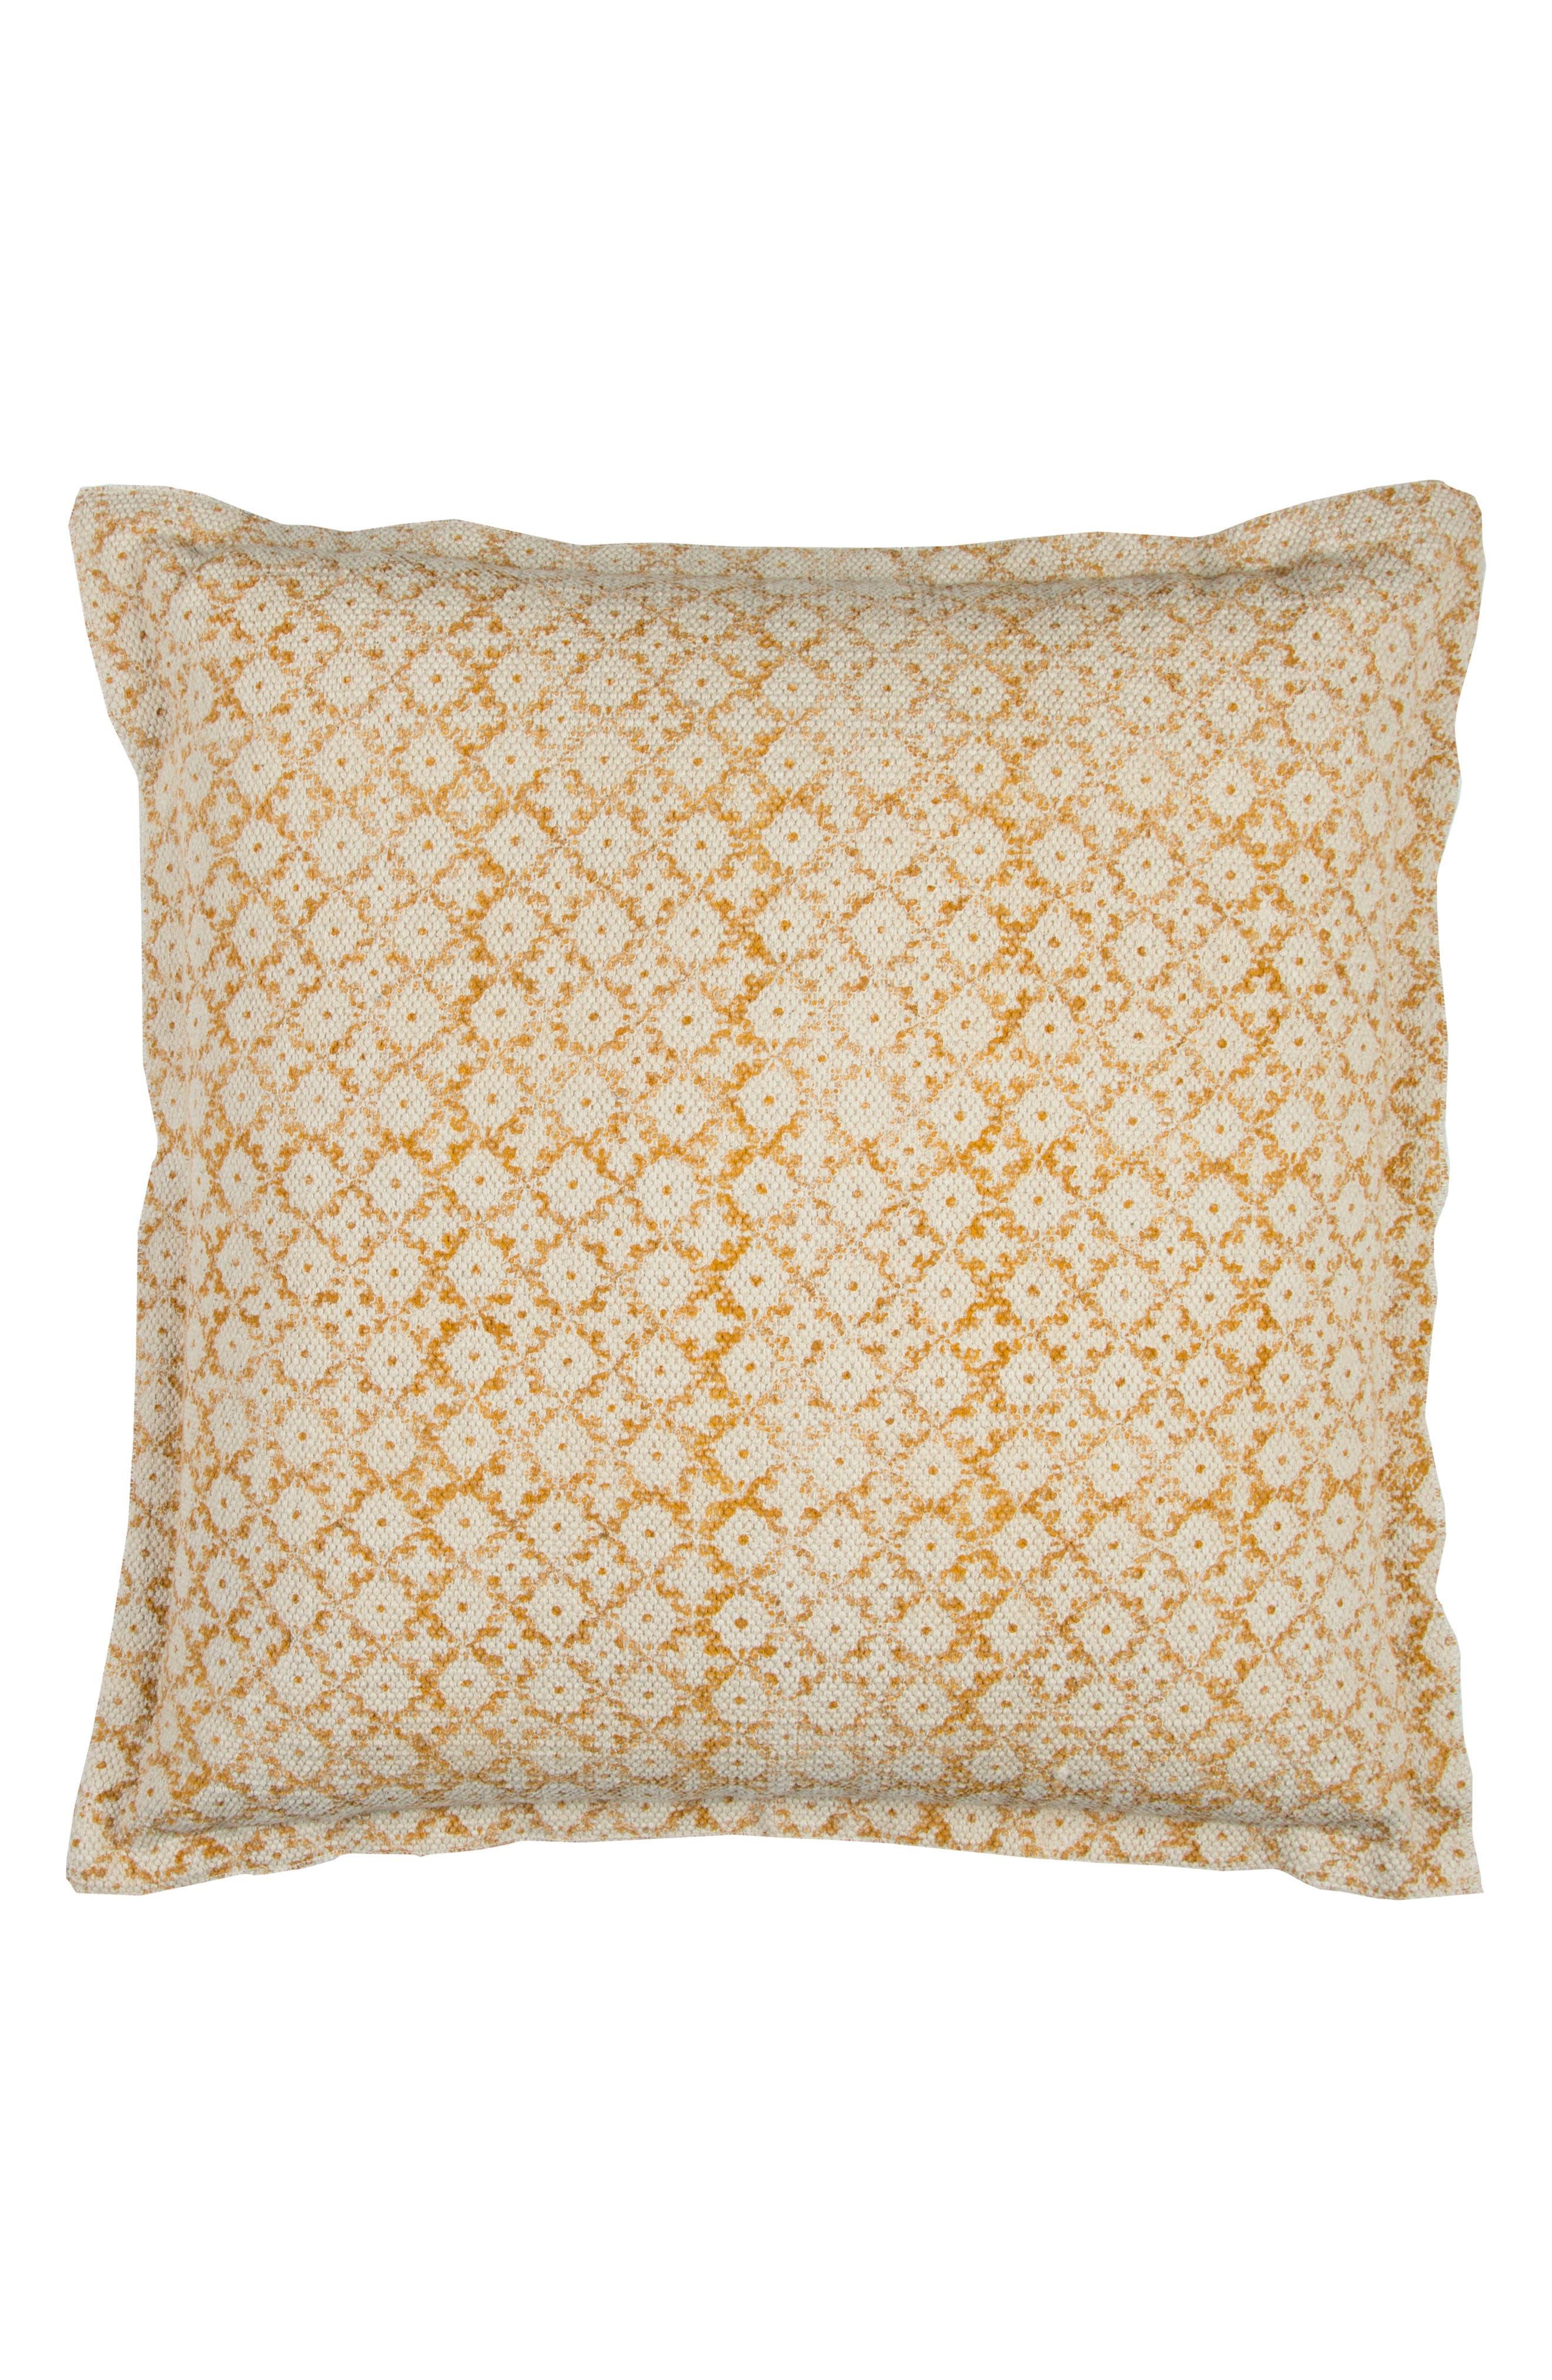 Geometric Accent Pillow,                             Main thumbnail 1, color,                             900